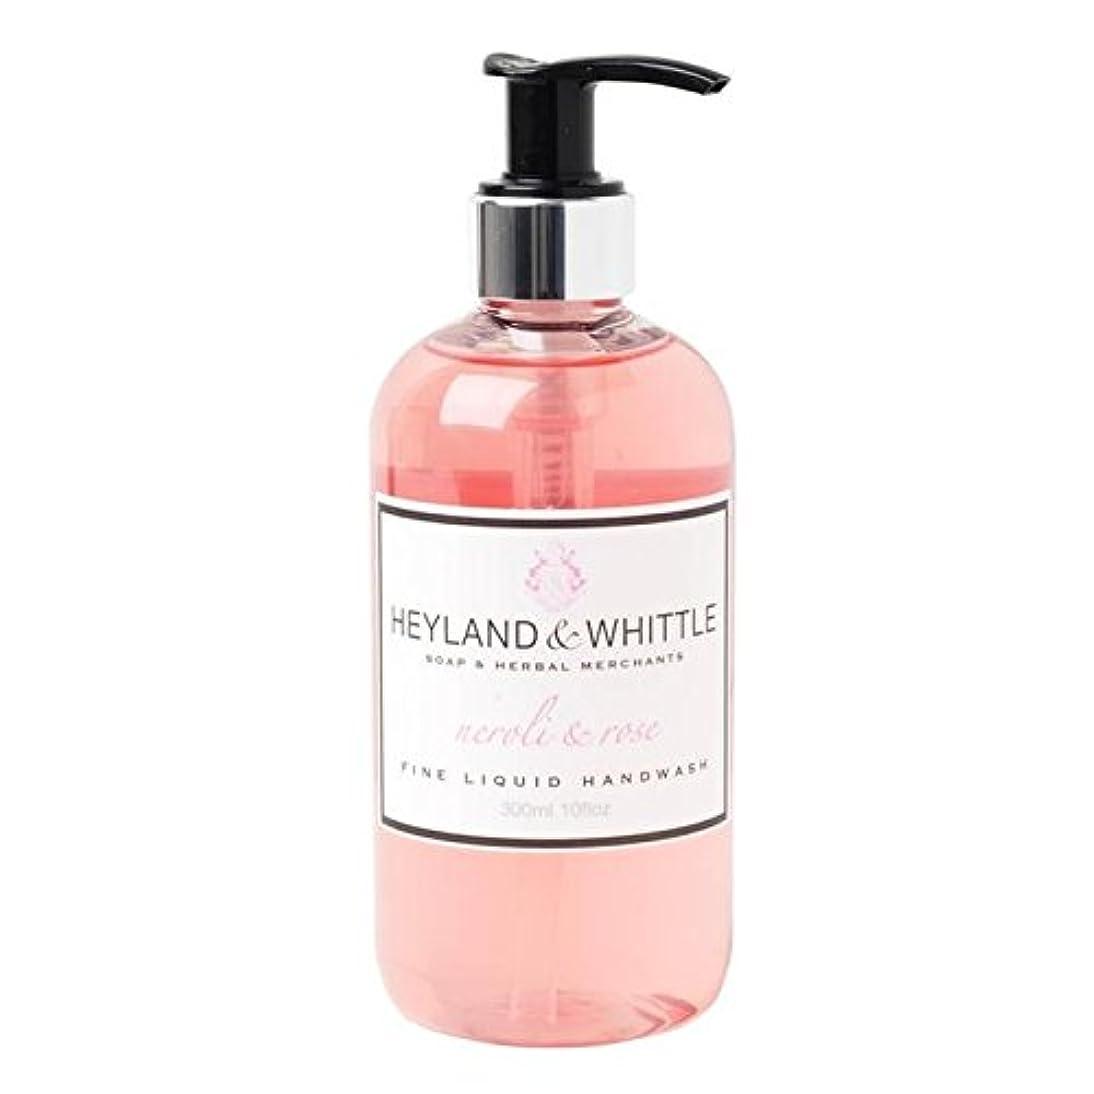 Heyland & Whittle Neroli & Rose Handwash 300ml - &削るネロリ&手洗いの300ミリリットルをバラ [並行輸入品]